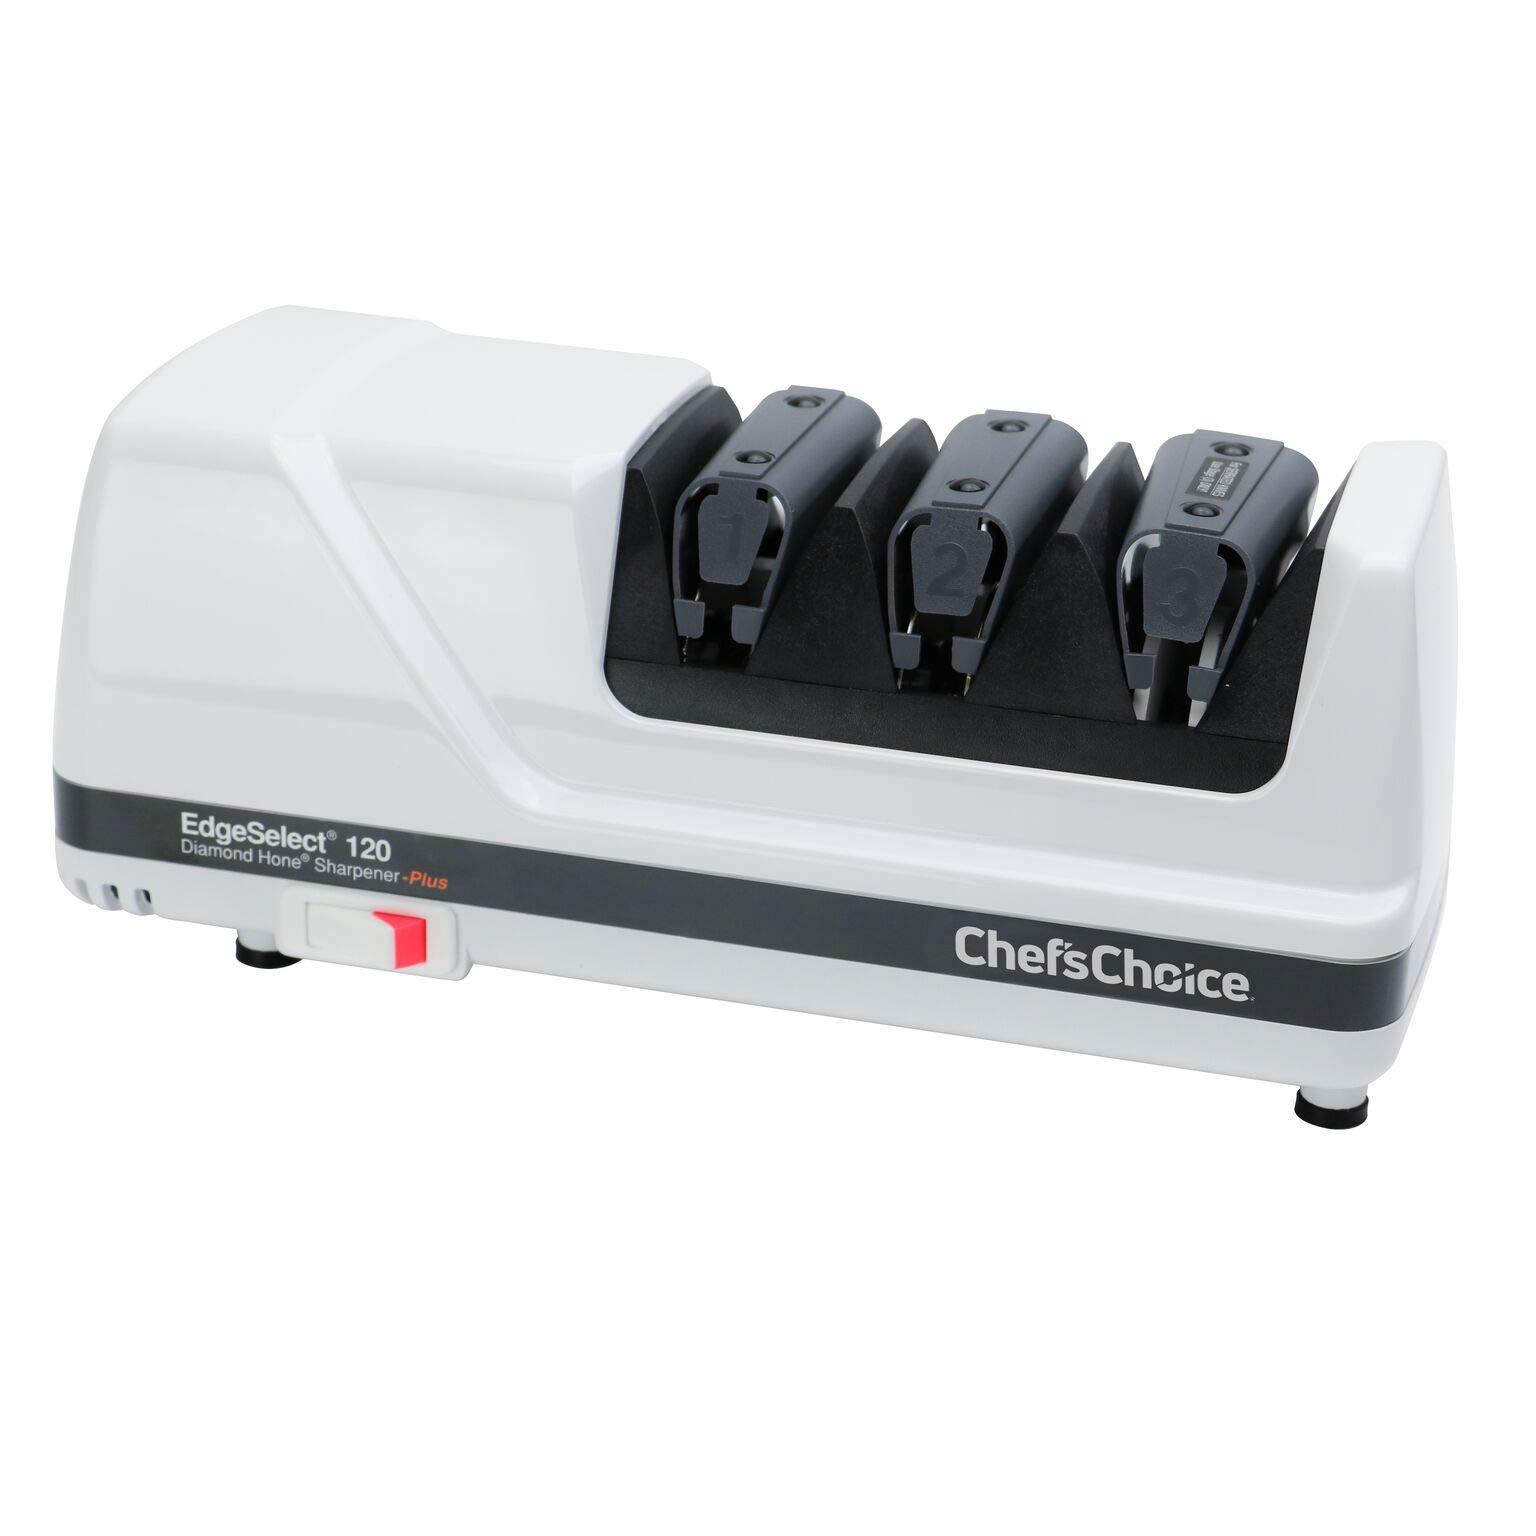 Chef's Choice(シェフチョイス) 電動式包丁研ぎ器 120Nの商品画像